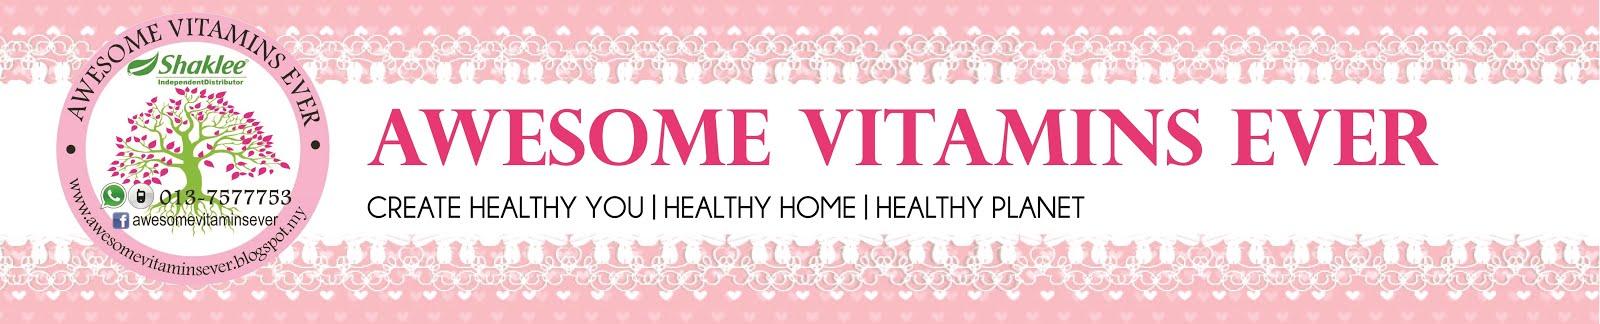 Awesome Vitamins Ever | Pengedar Sah Shaklee Taman Nong Chik, Bandaraya Johor Bahru, Taman Daya